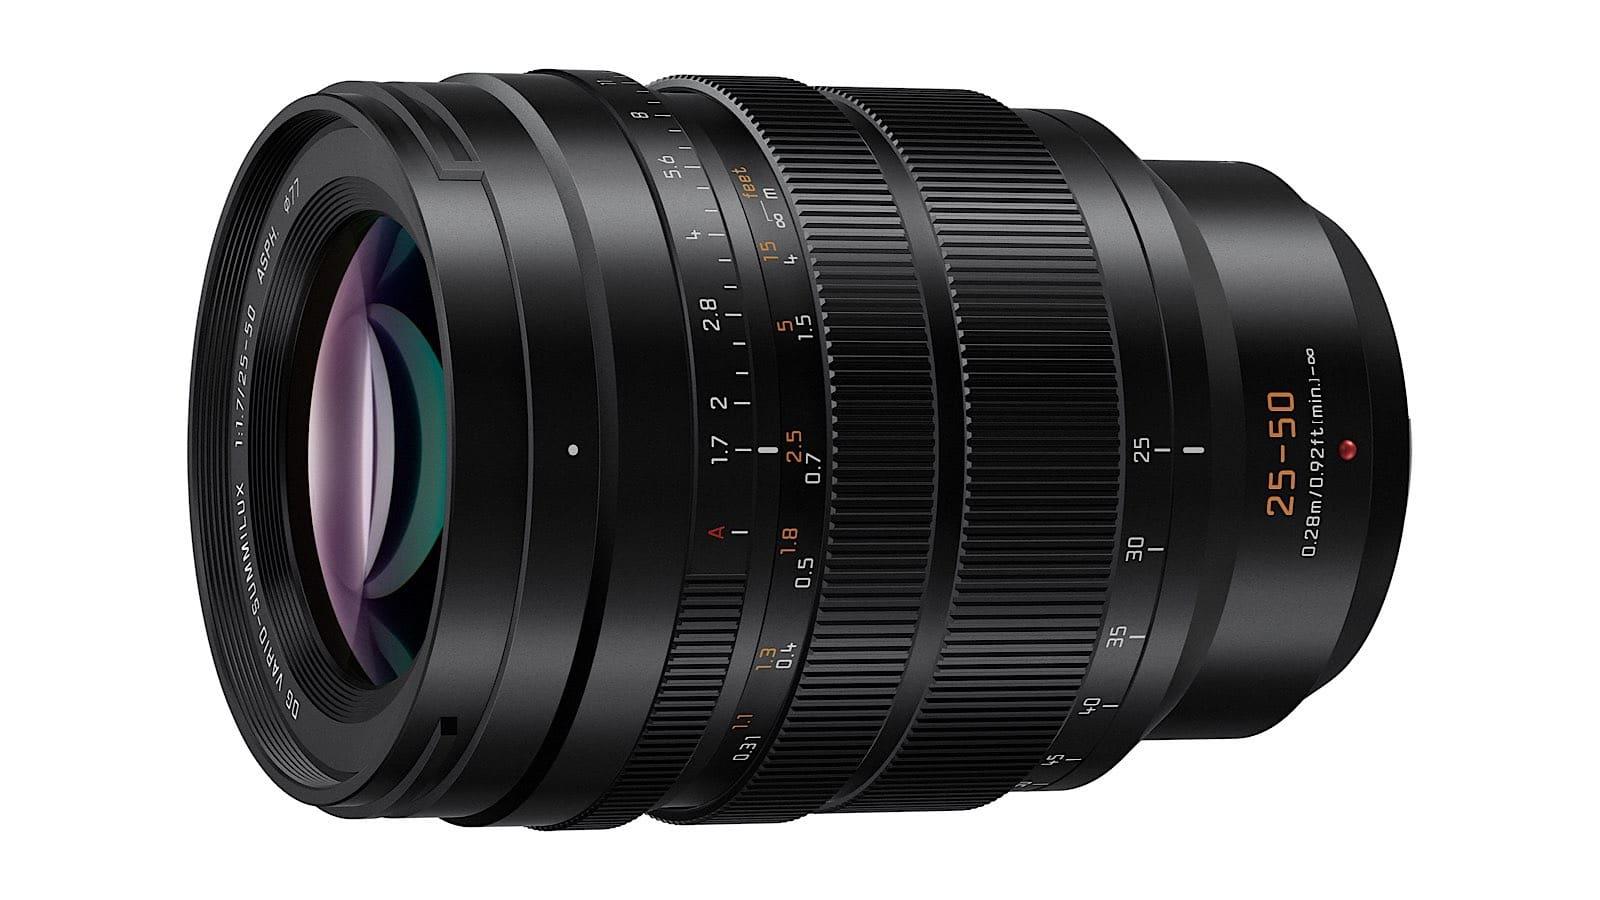 Leica 25-50mm F1.7 lens for Panasonic Lumix G